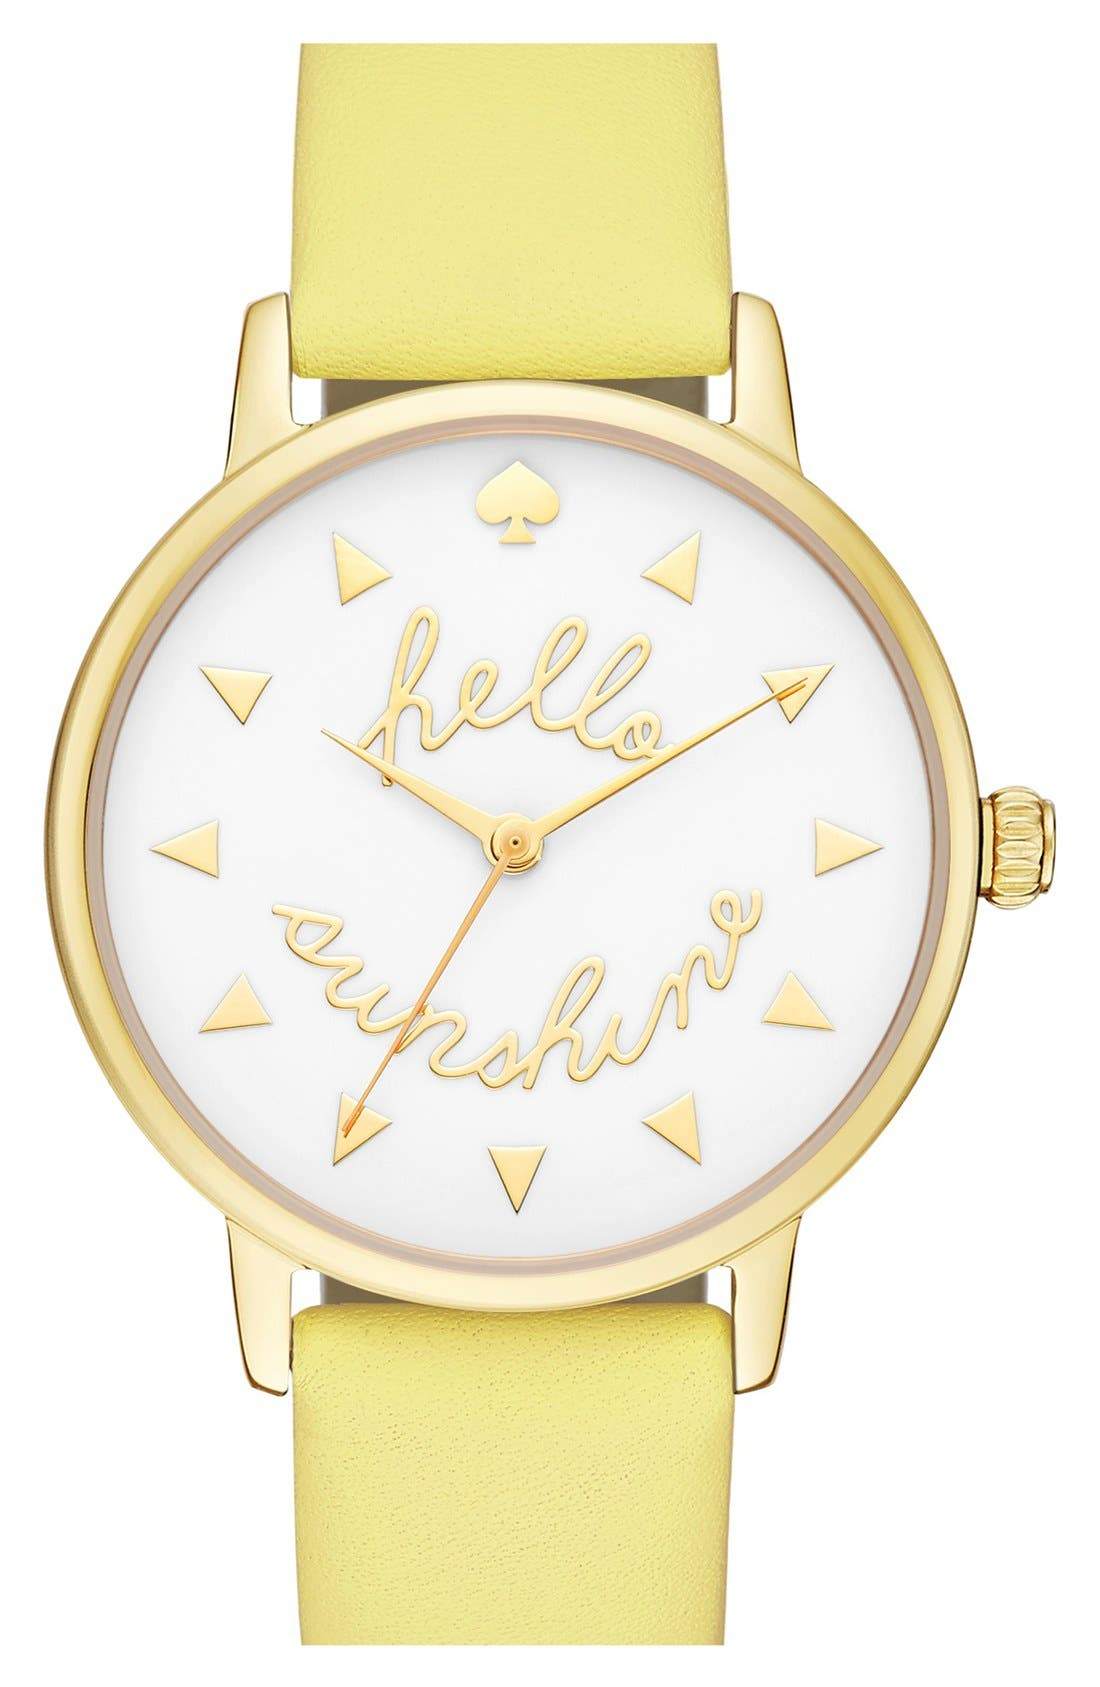 Main Image - kate spade new york 'metro - sunshine' leather strap watch, 34mm